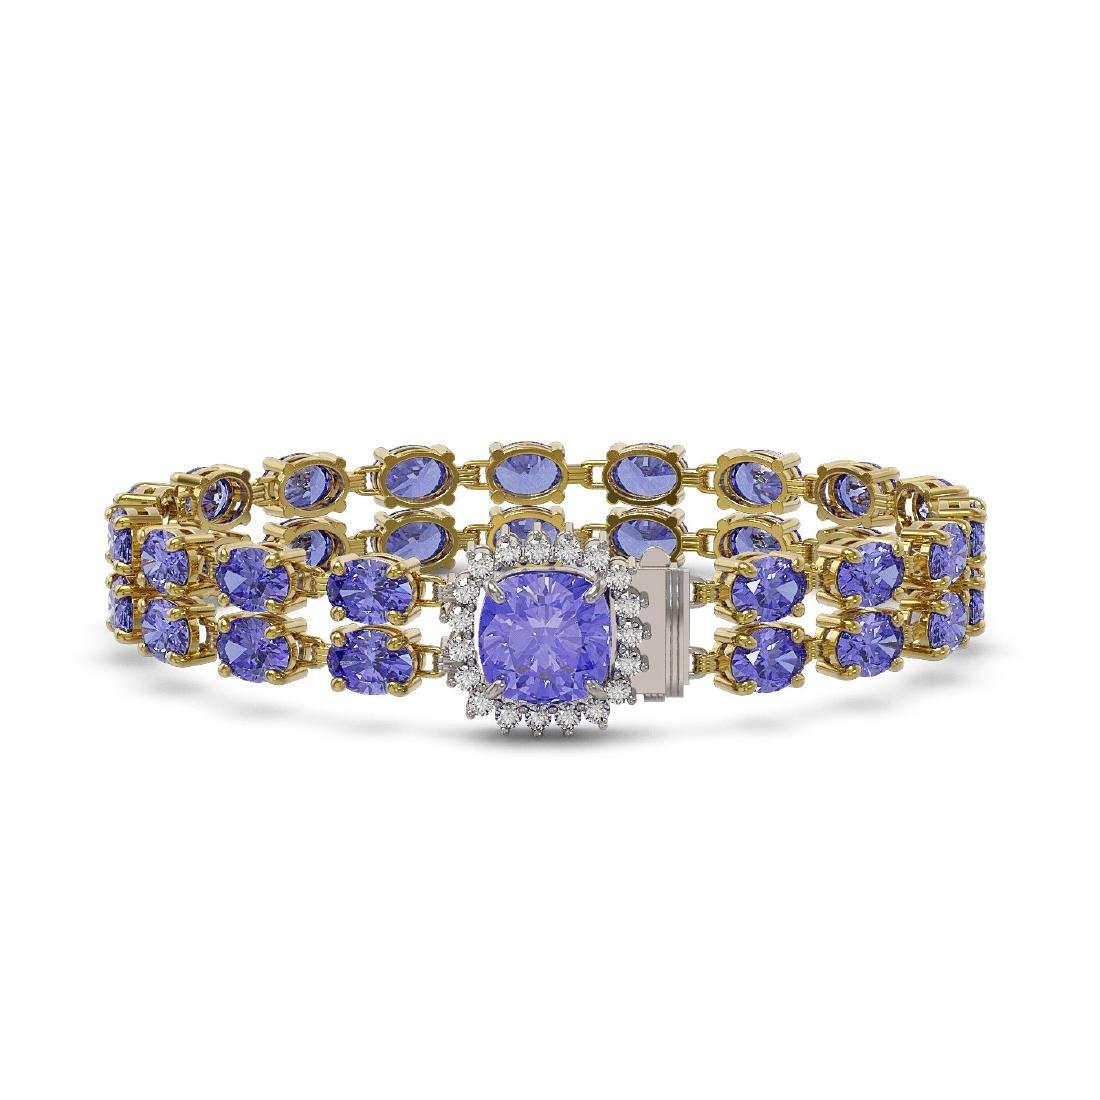 30.43 ctw Tanzanite & Diamond Bracelet 14K Yellow Gold